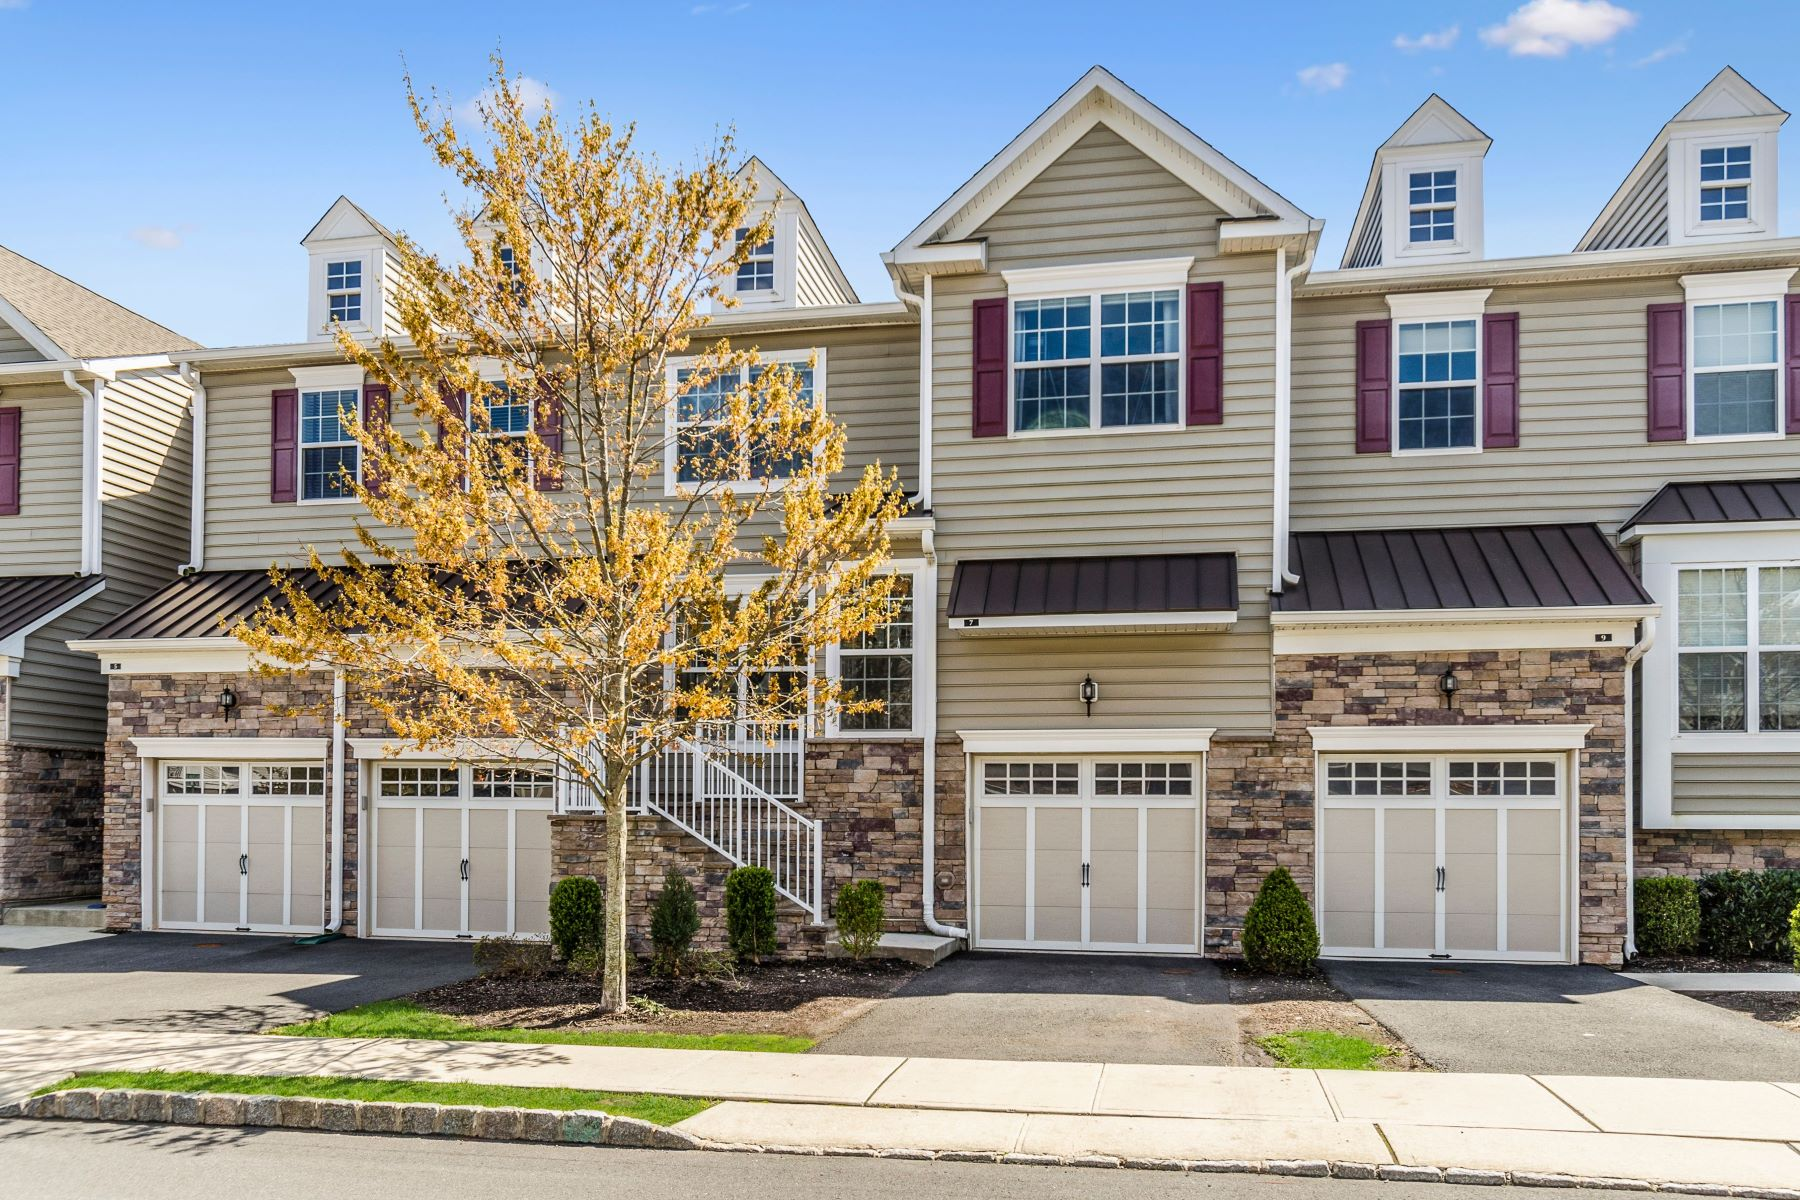 townhouses للـ Sale في A Designer Feel To This Montgomery Ridge Home 7 Braeburn Drive, Skillman, New Jersey 08558 United States